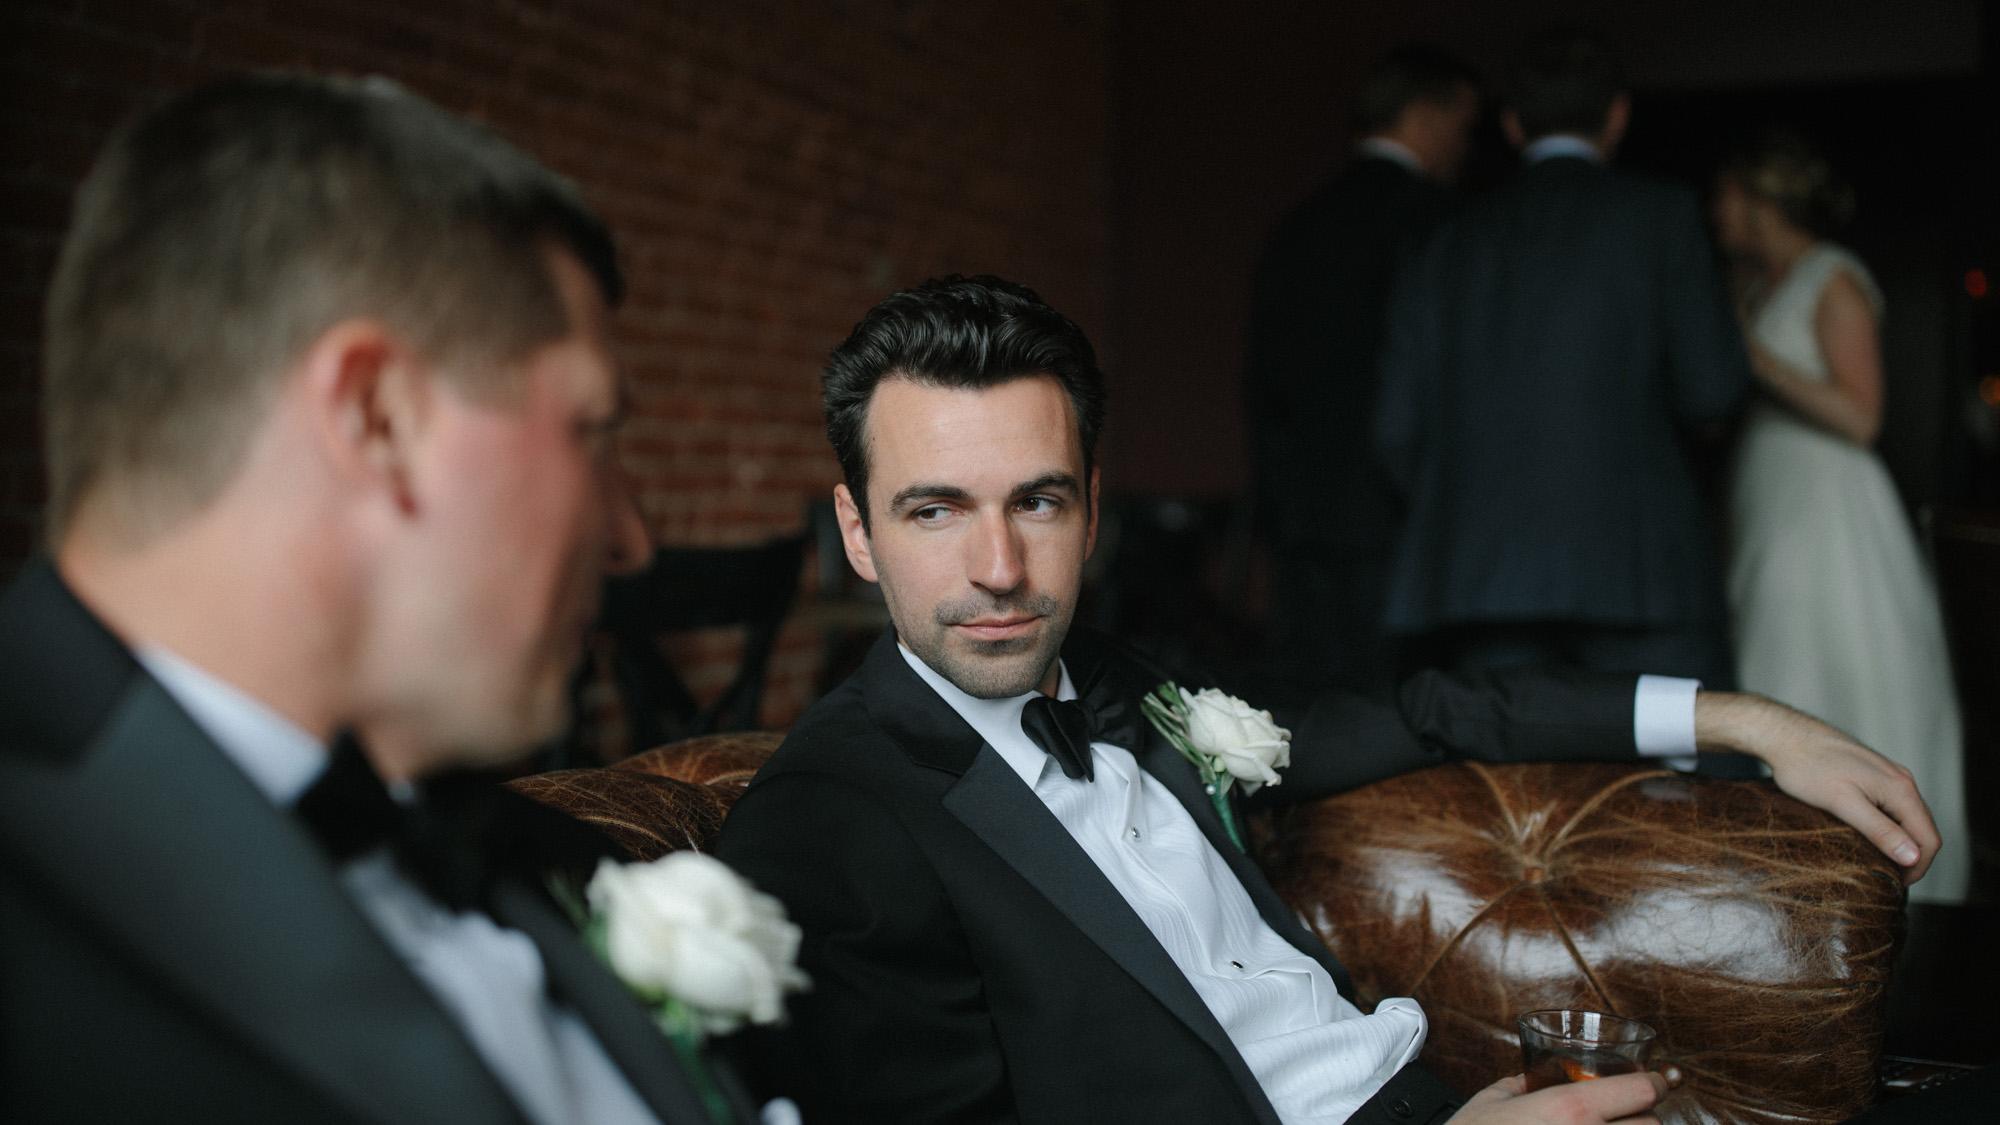 Alec_Vanderboom_kansas_city_hip_wedding_photos-0041.jpg